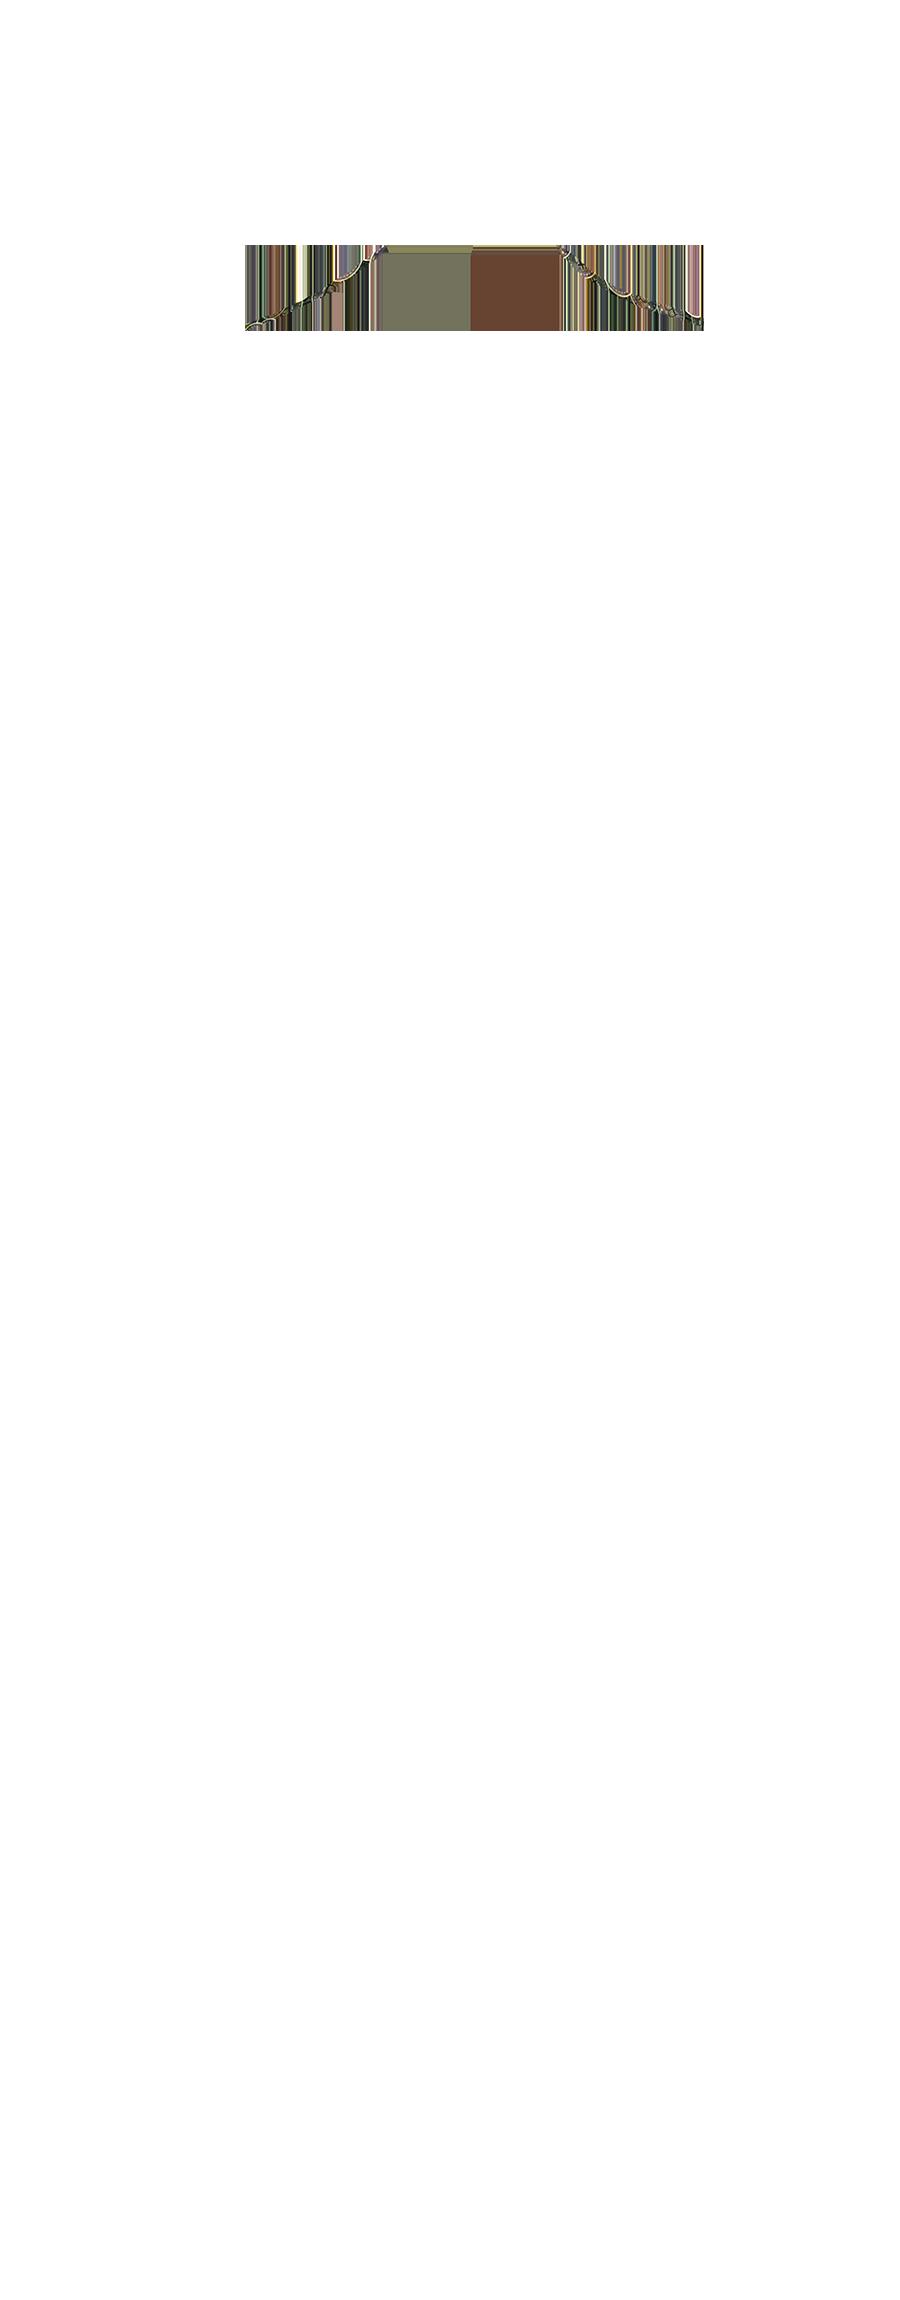 NEFL-6